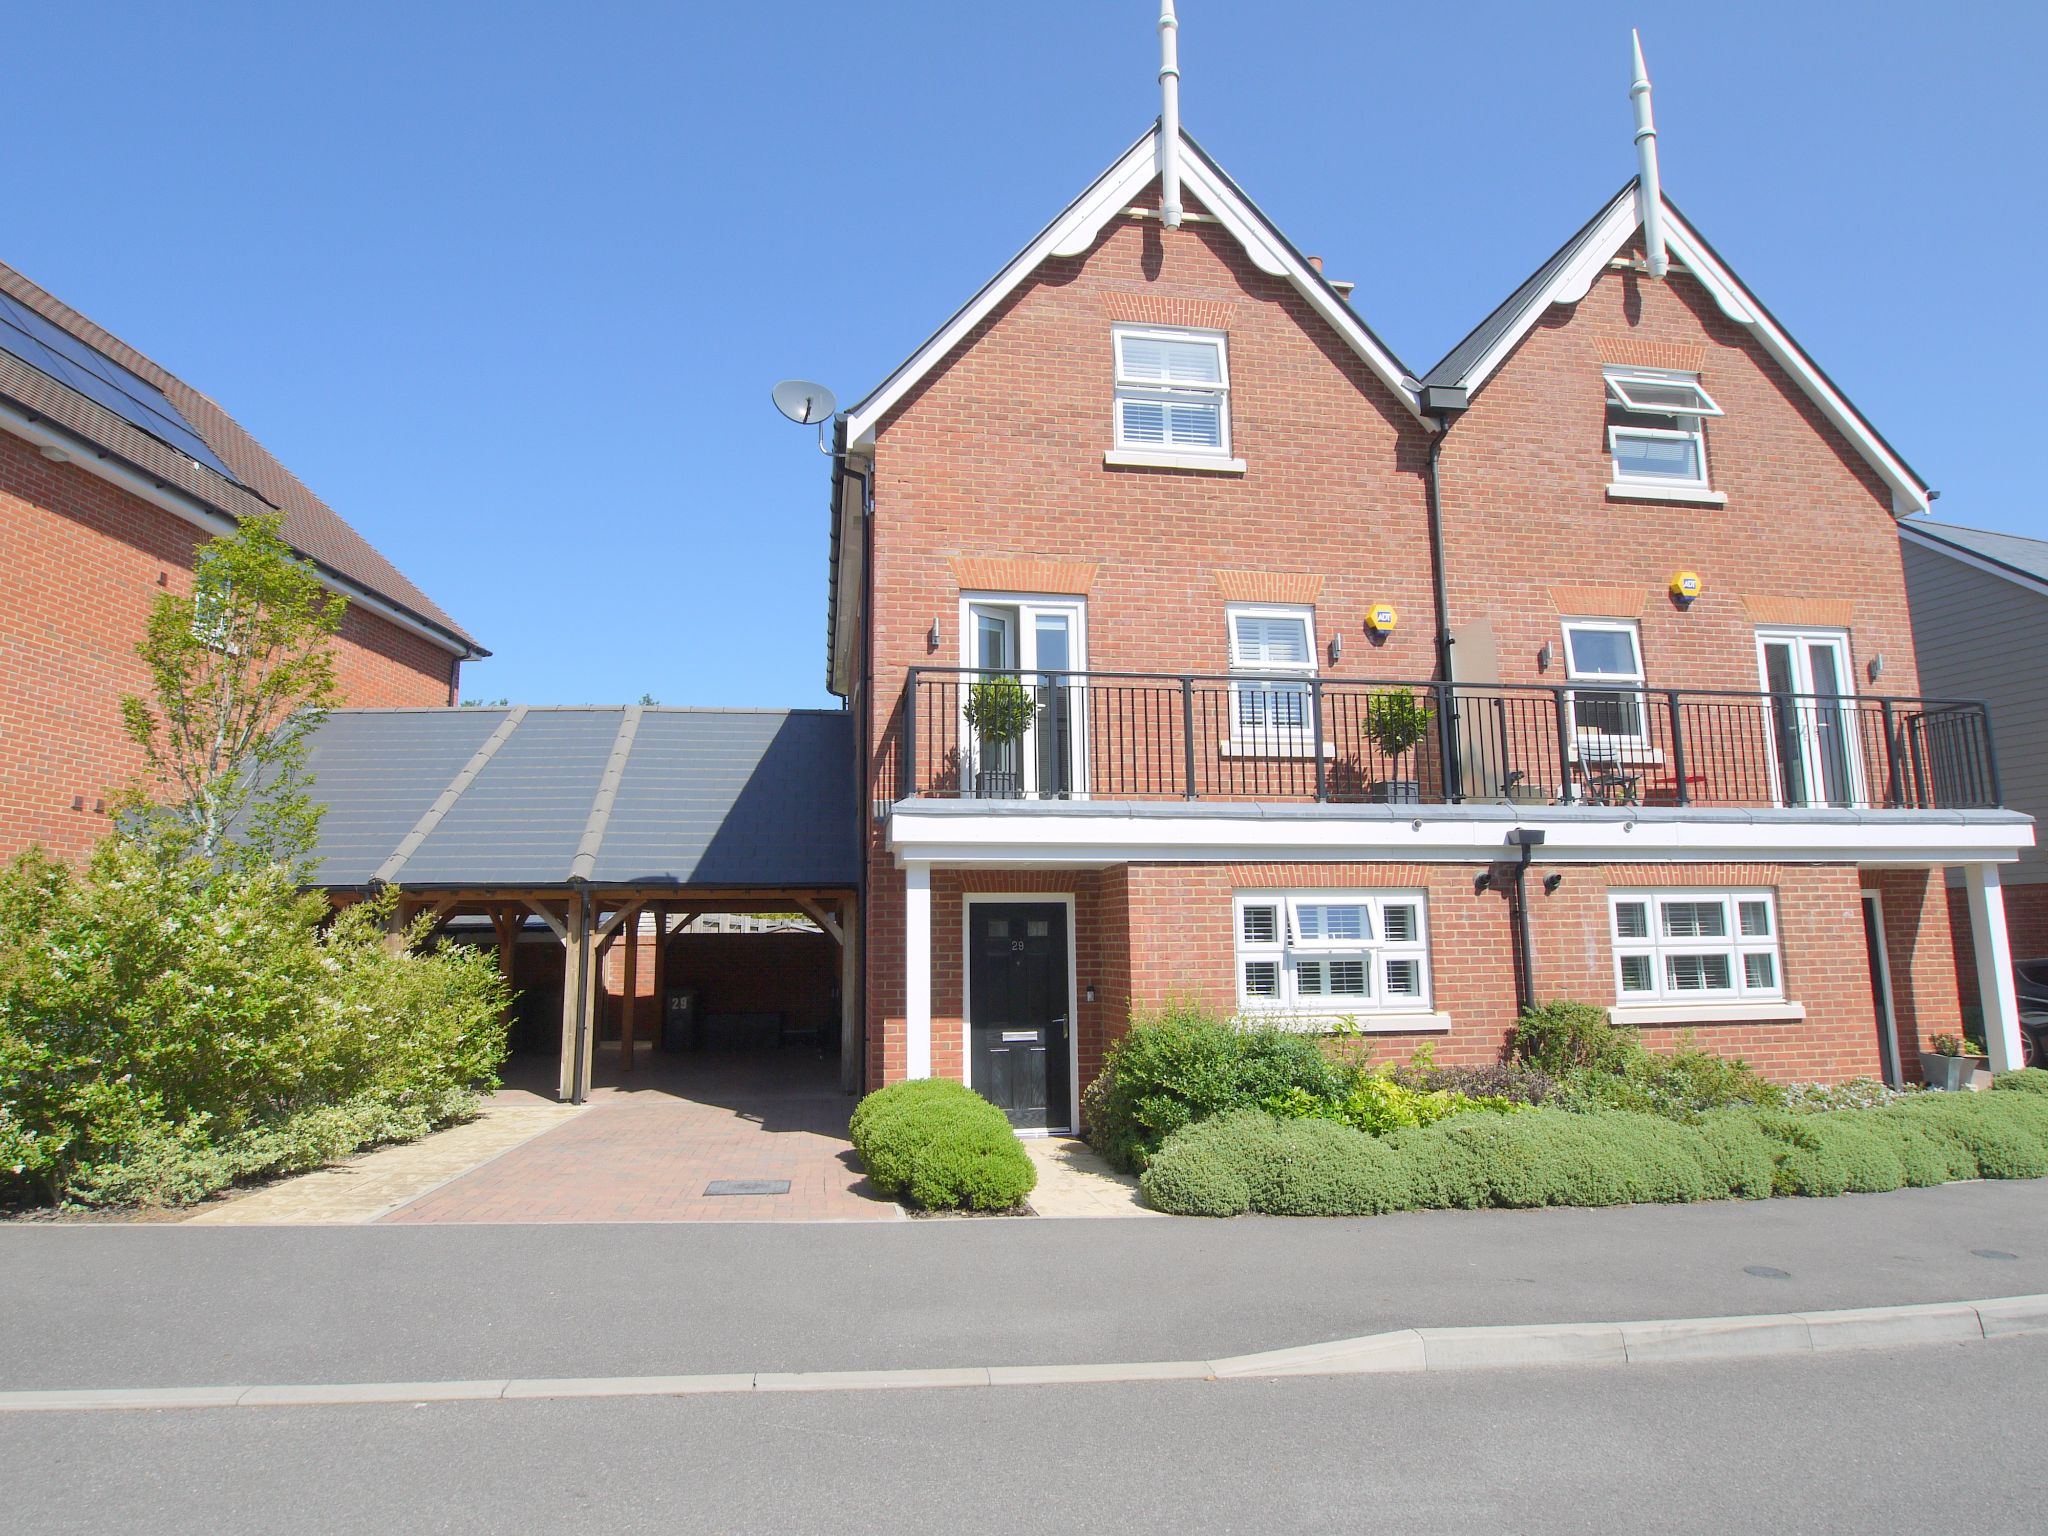 5 bedroom semi-detached house For Sale in Tonbridge - Photograph 1